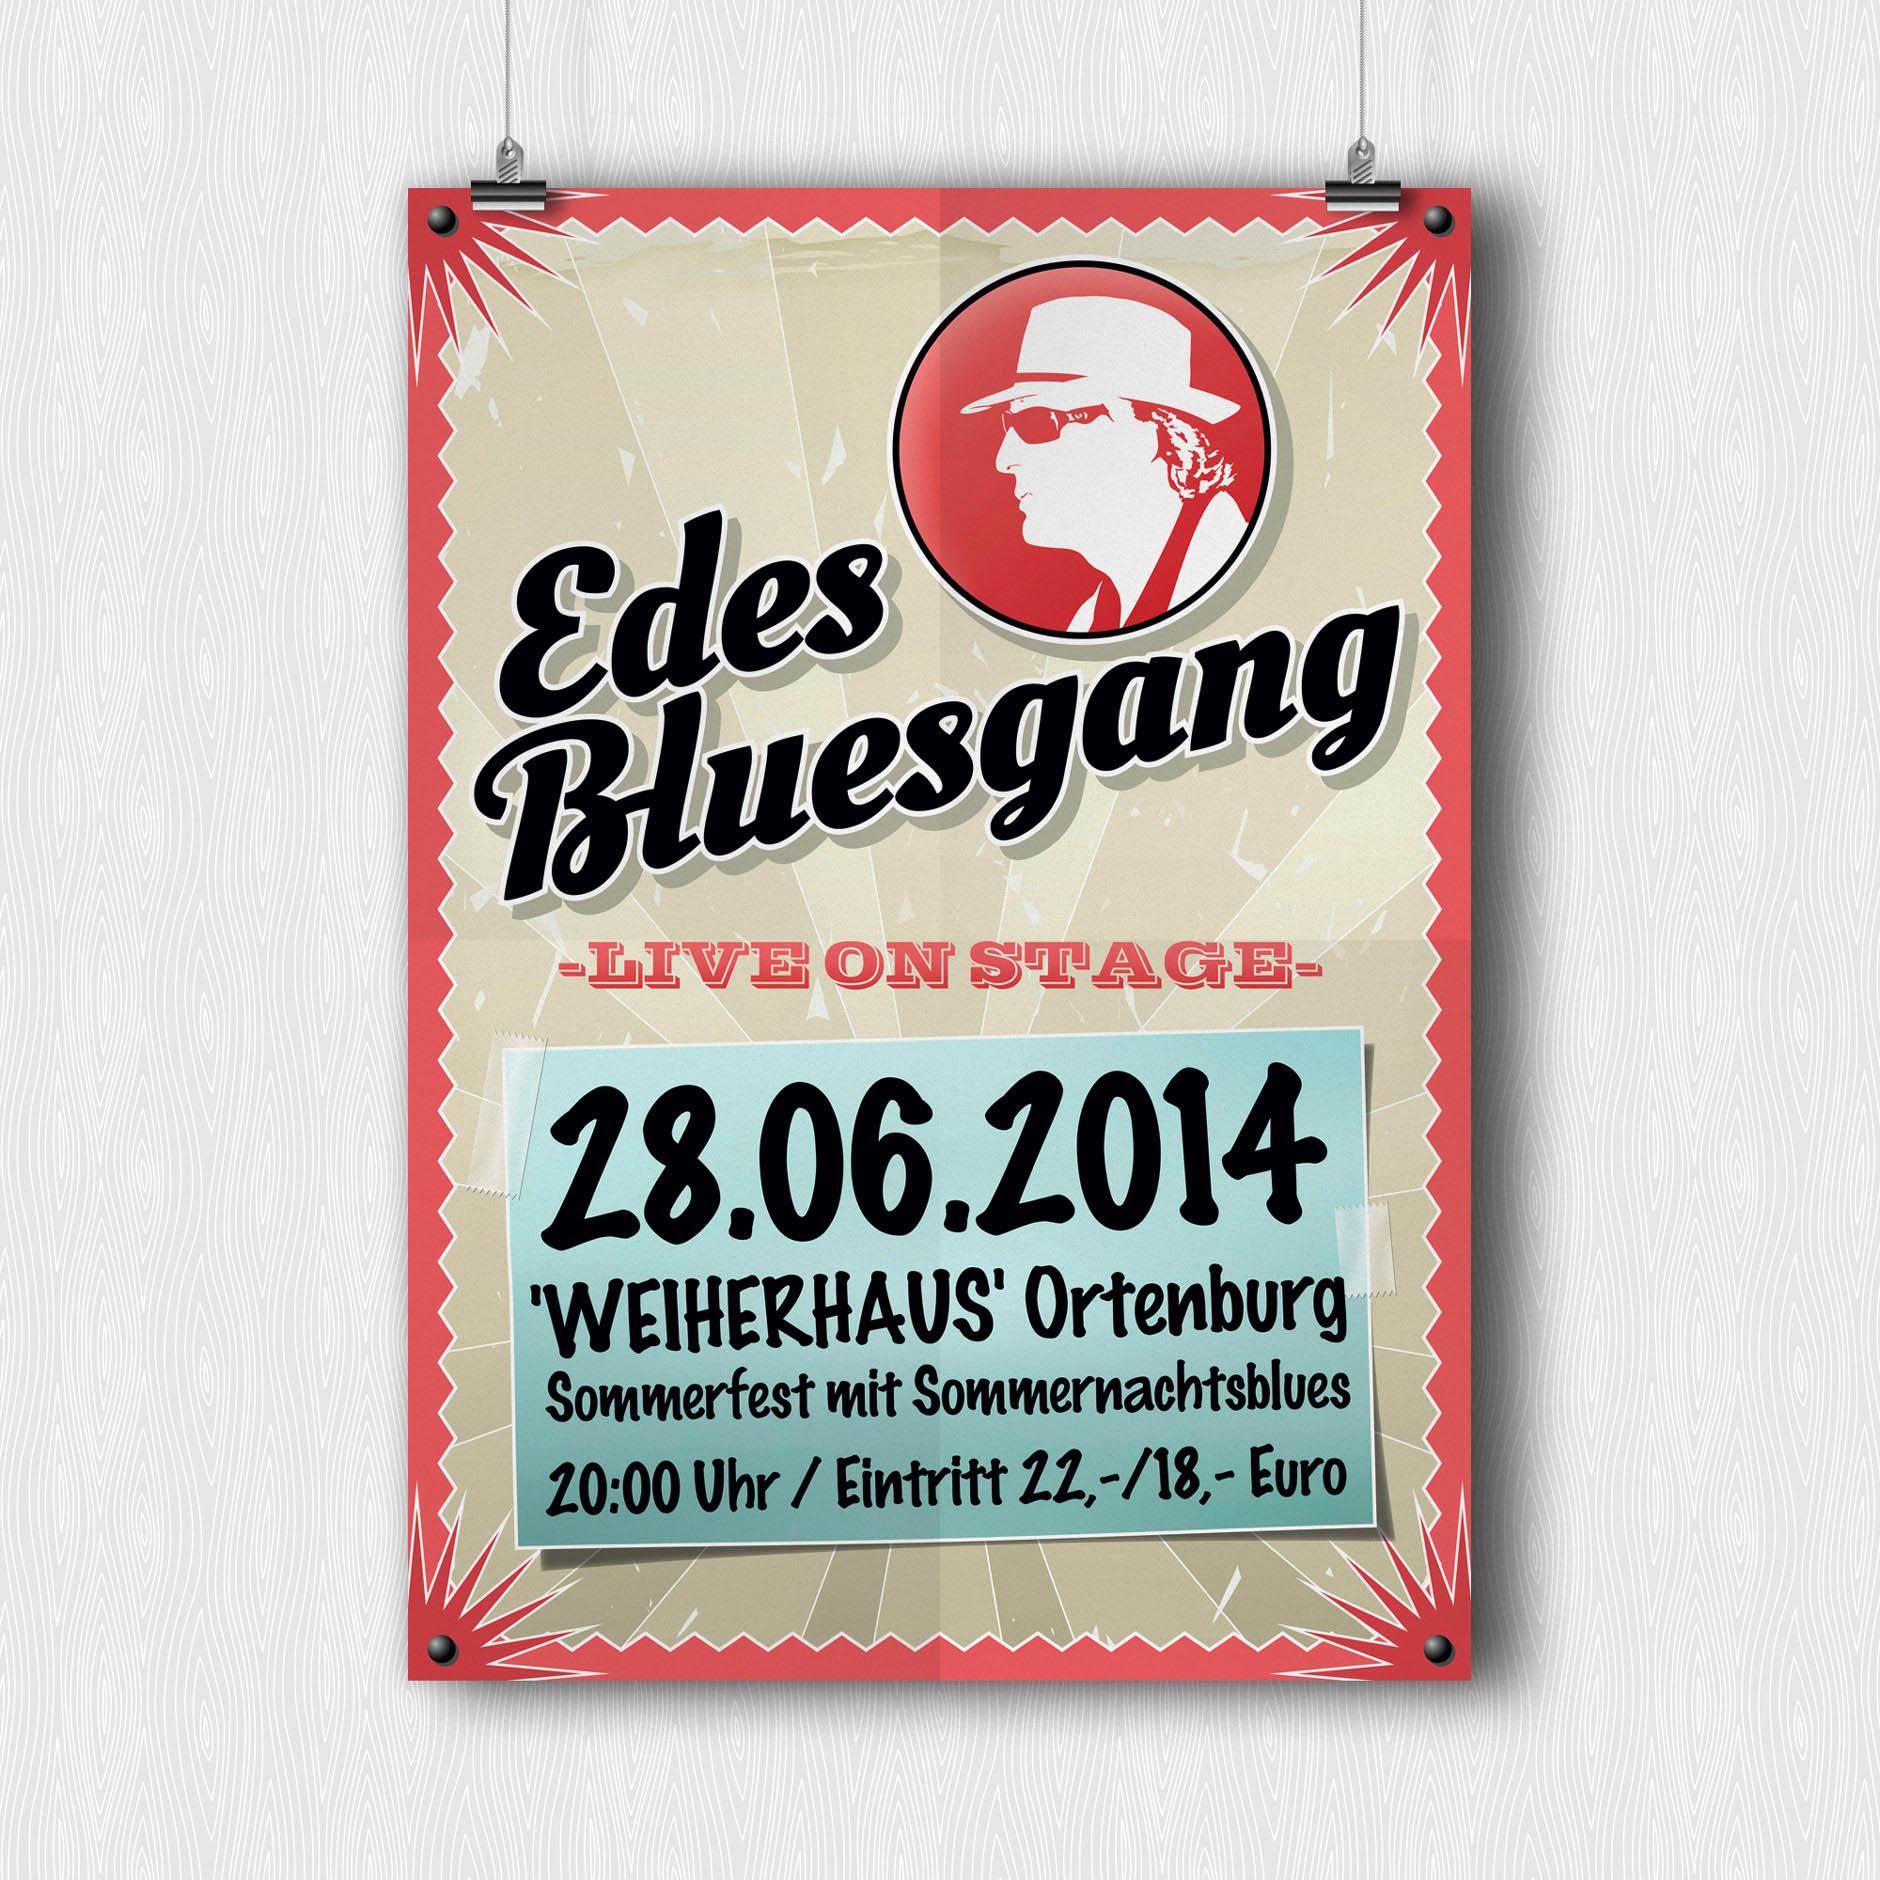 Plakat EDEs BLUESGANG